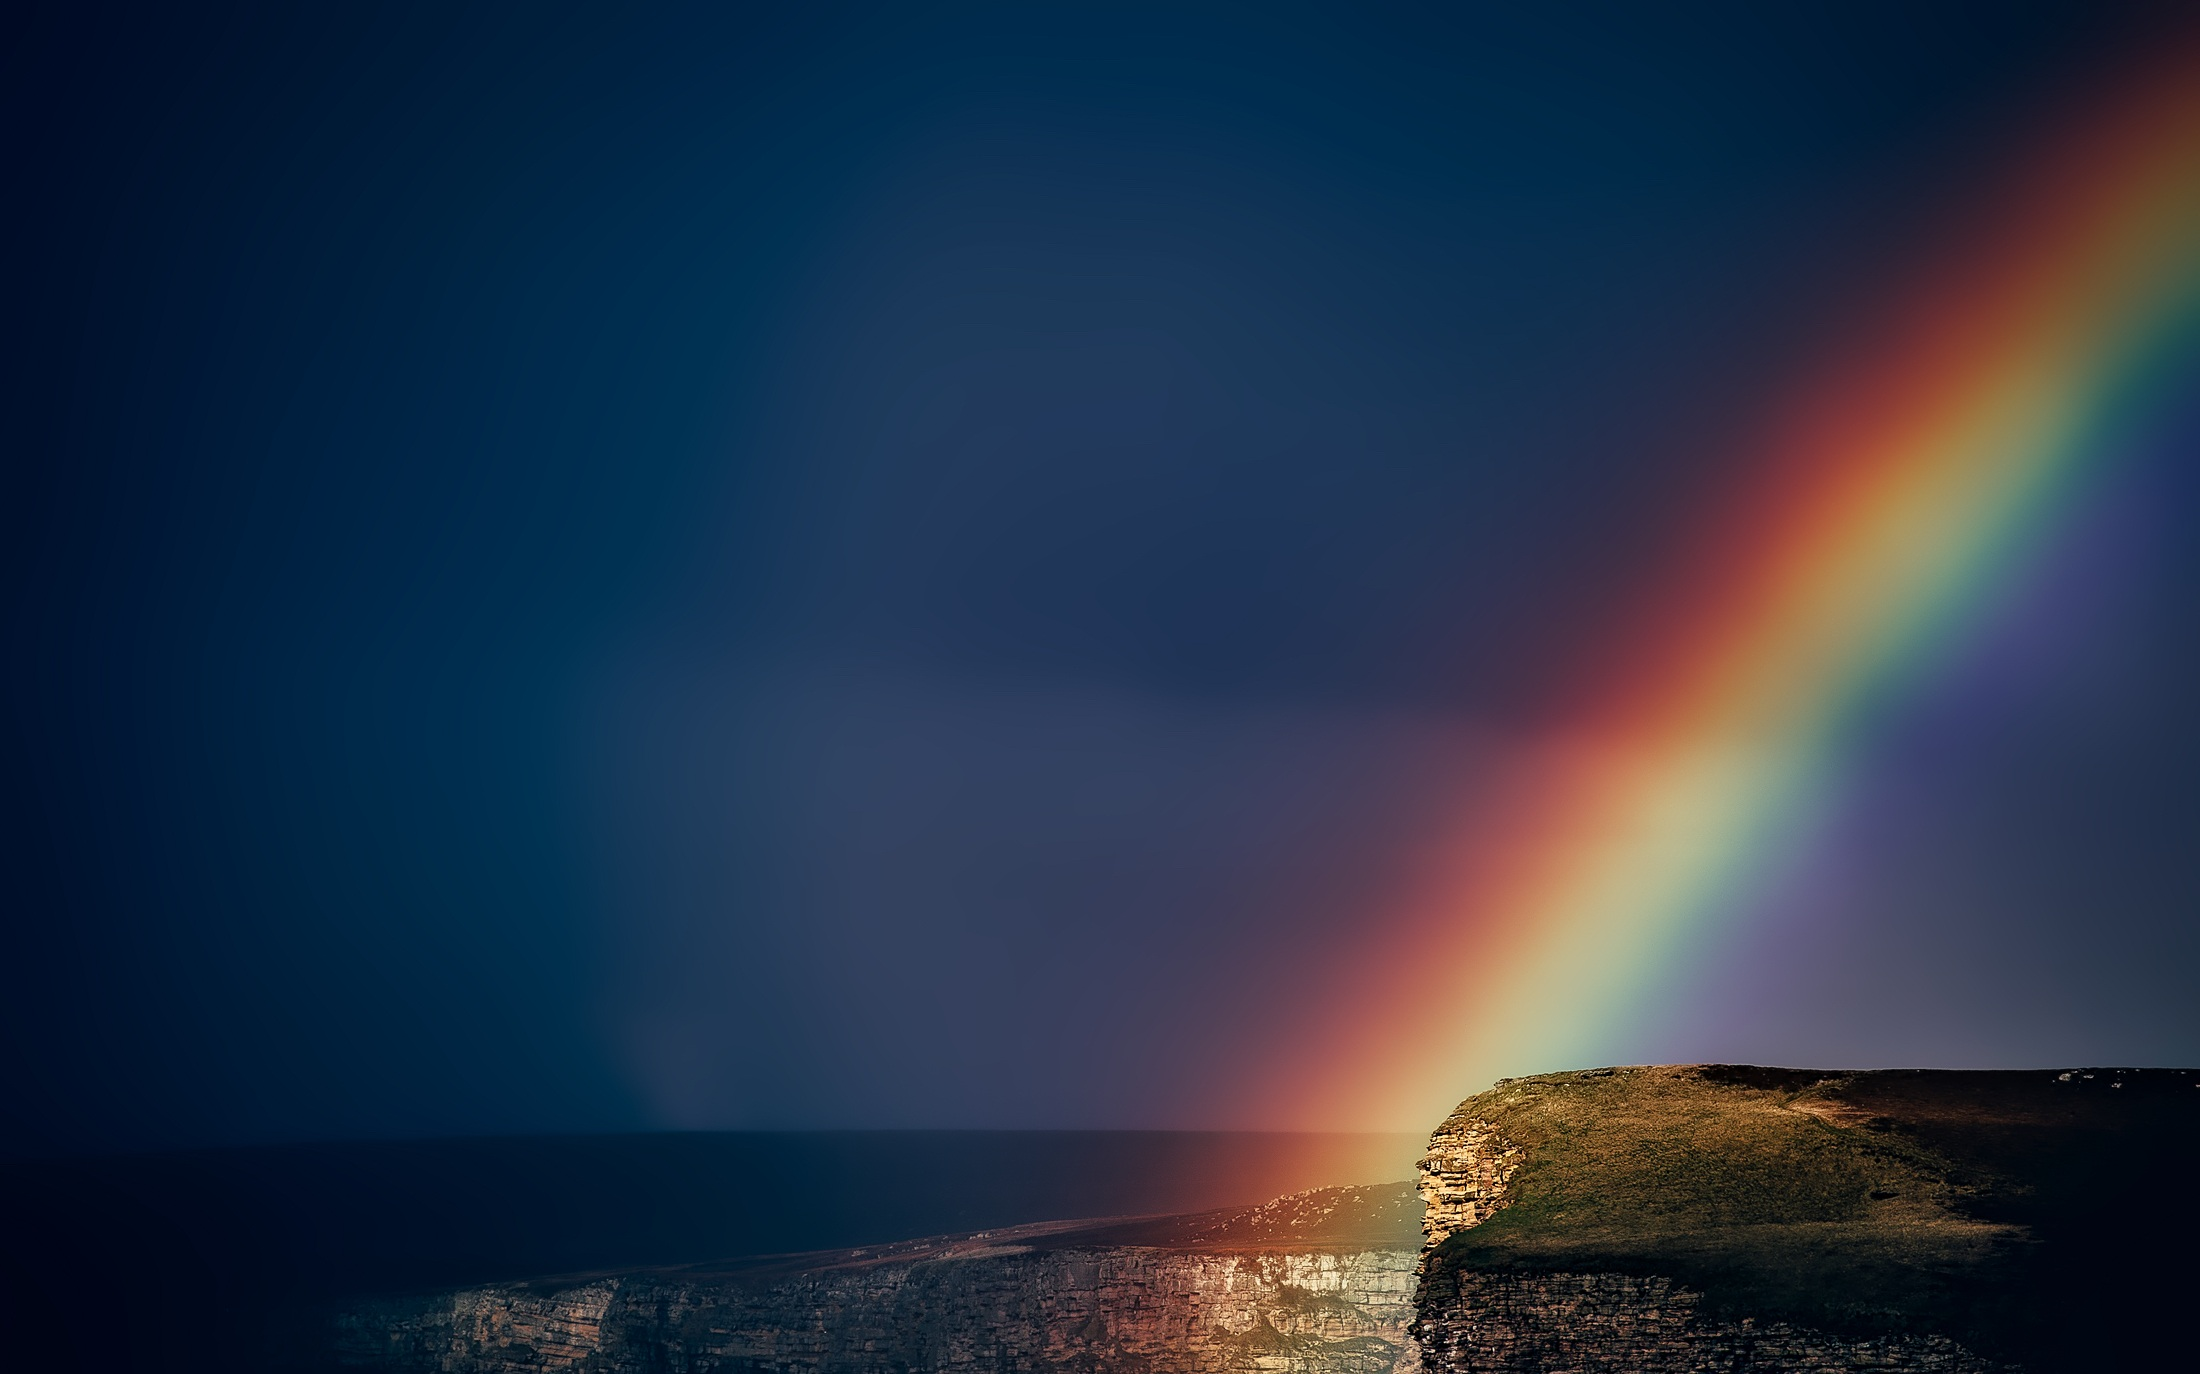 Rainbow Dash Wallpaper Hd 200 Great Rainbow Photos 183 Pexels 183 Free Stock Photos